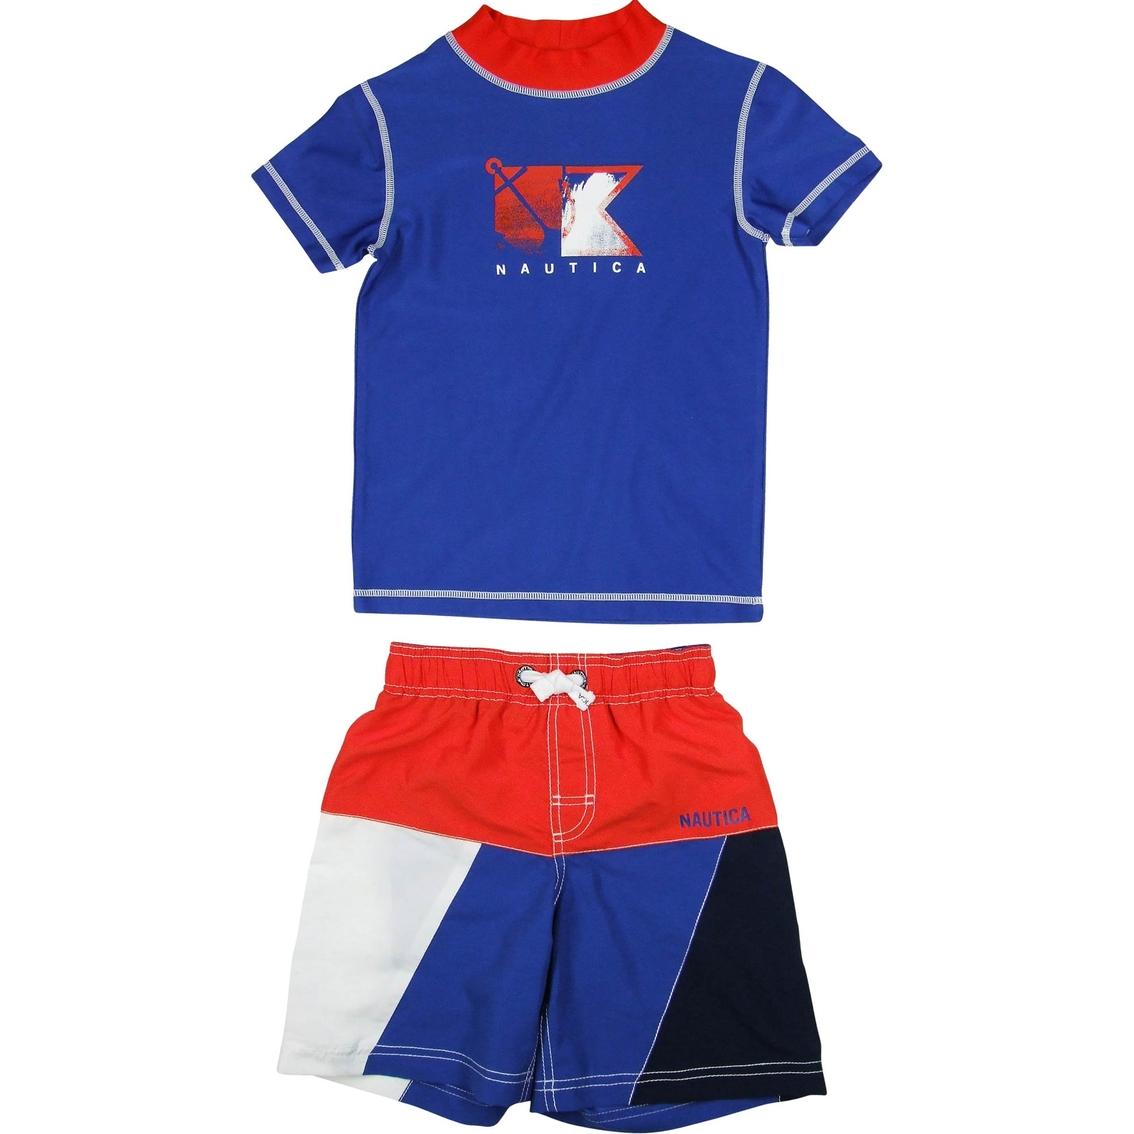 5a08bf0c71 Nautica Little Boys 2 Pc. Rashguard And Colorblock Swim Trunk Set ...